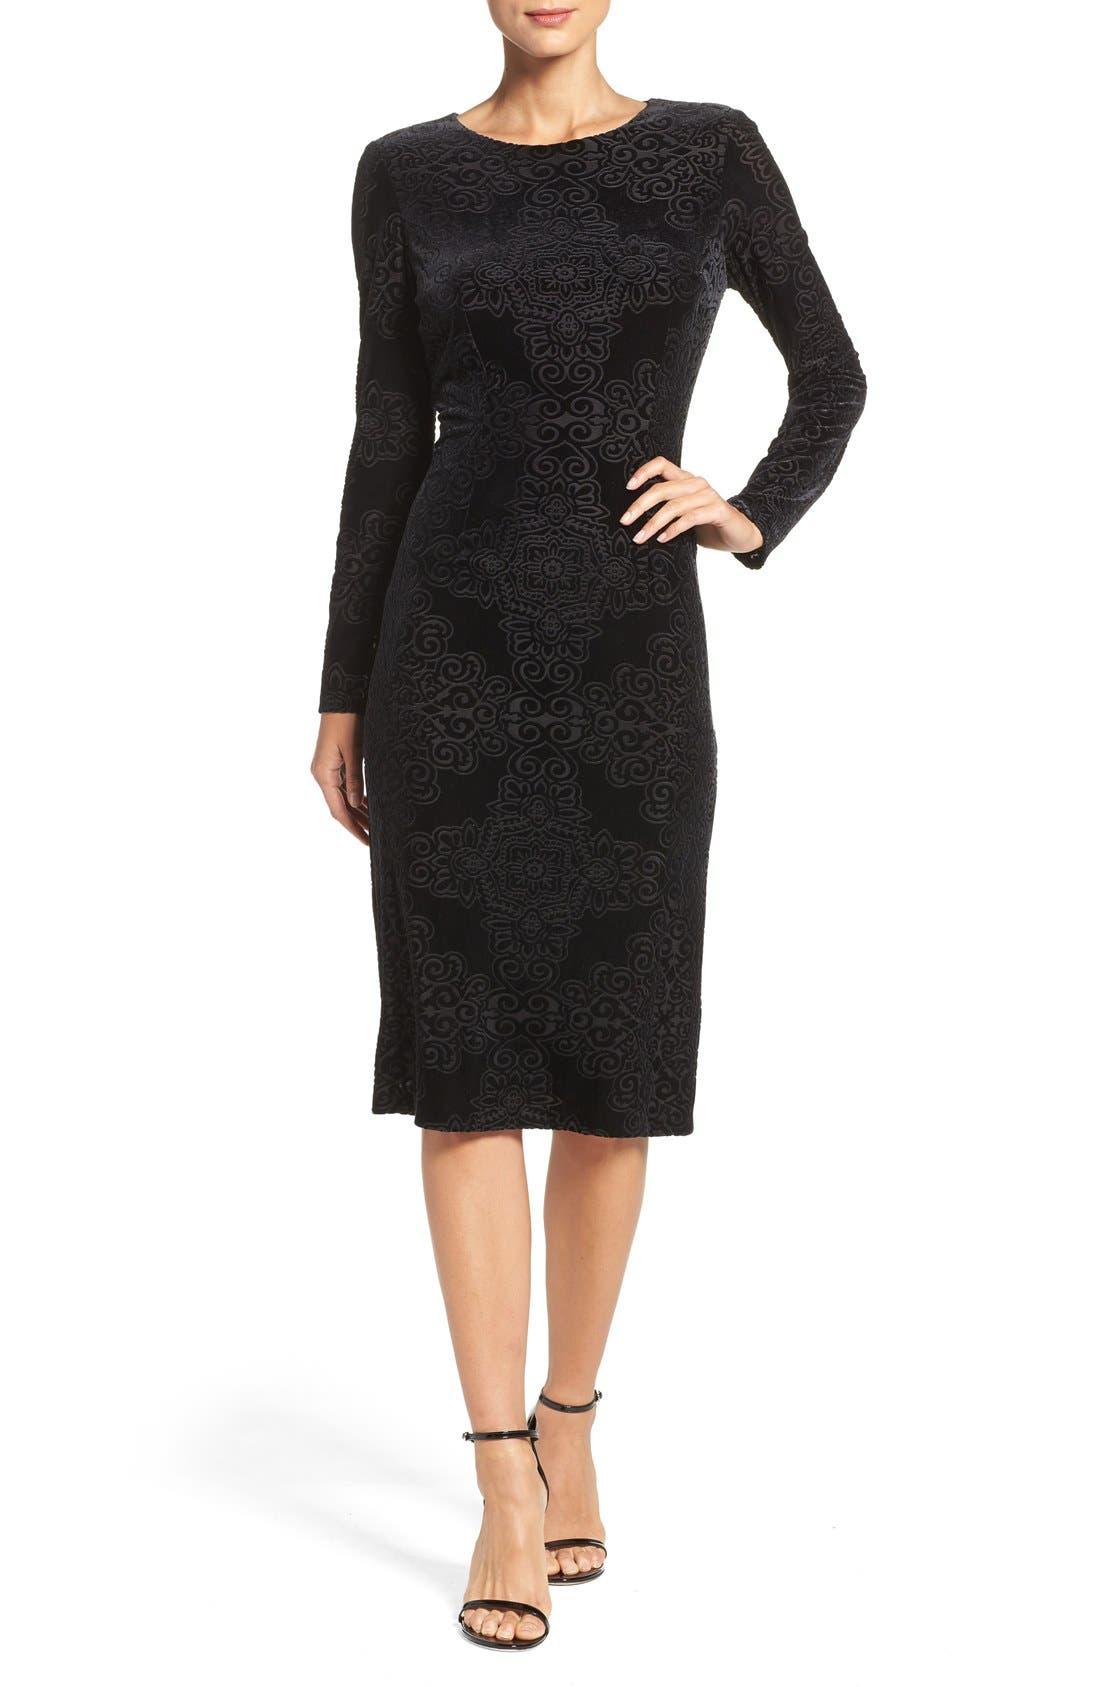 Alternate Image 1 Selected - Maggy London Burnout Velvet Sheath Dress (Regular & Petite)